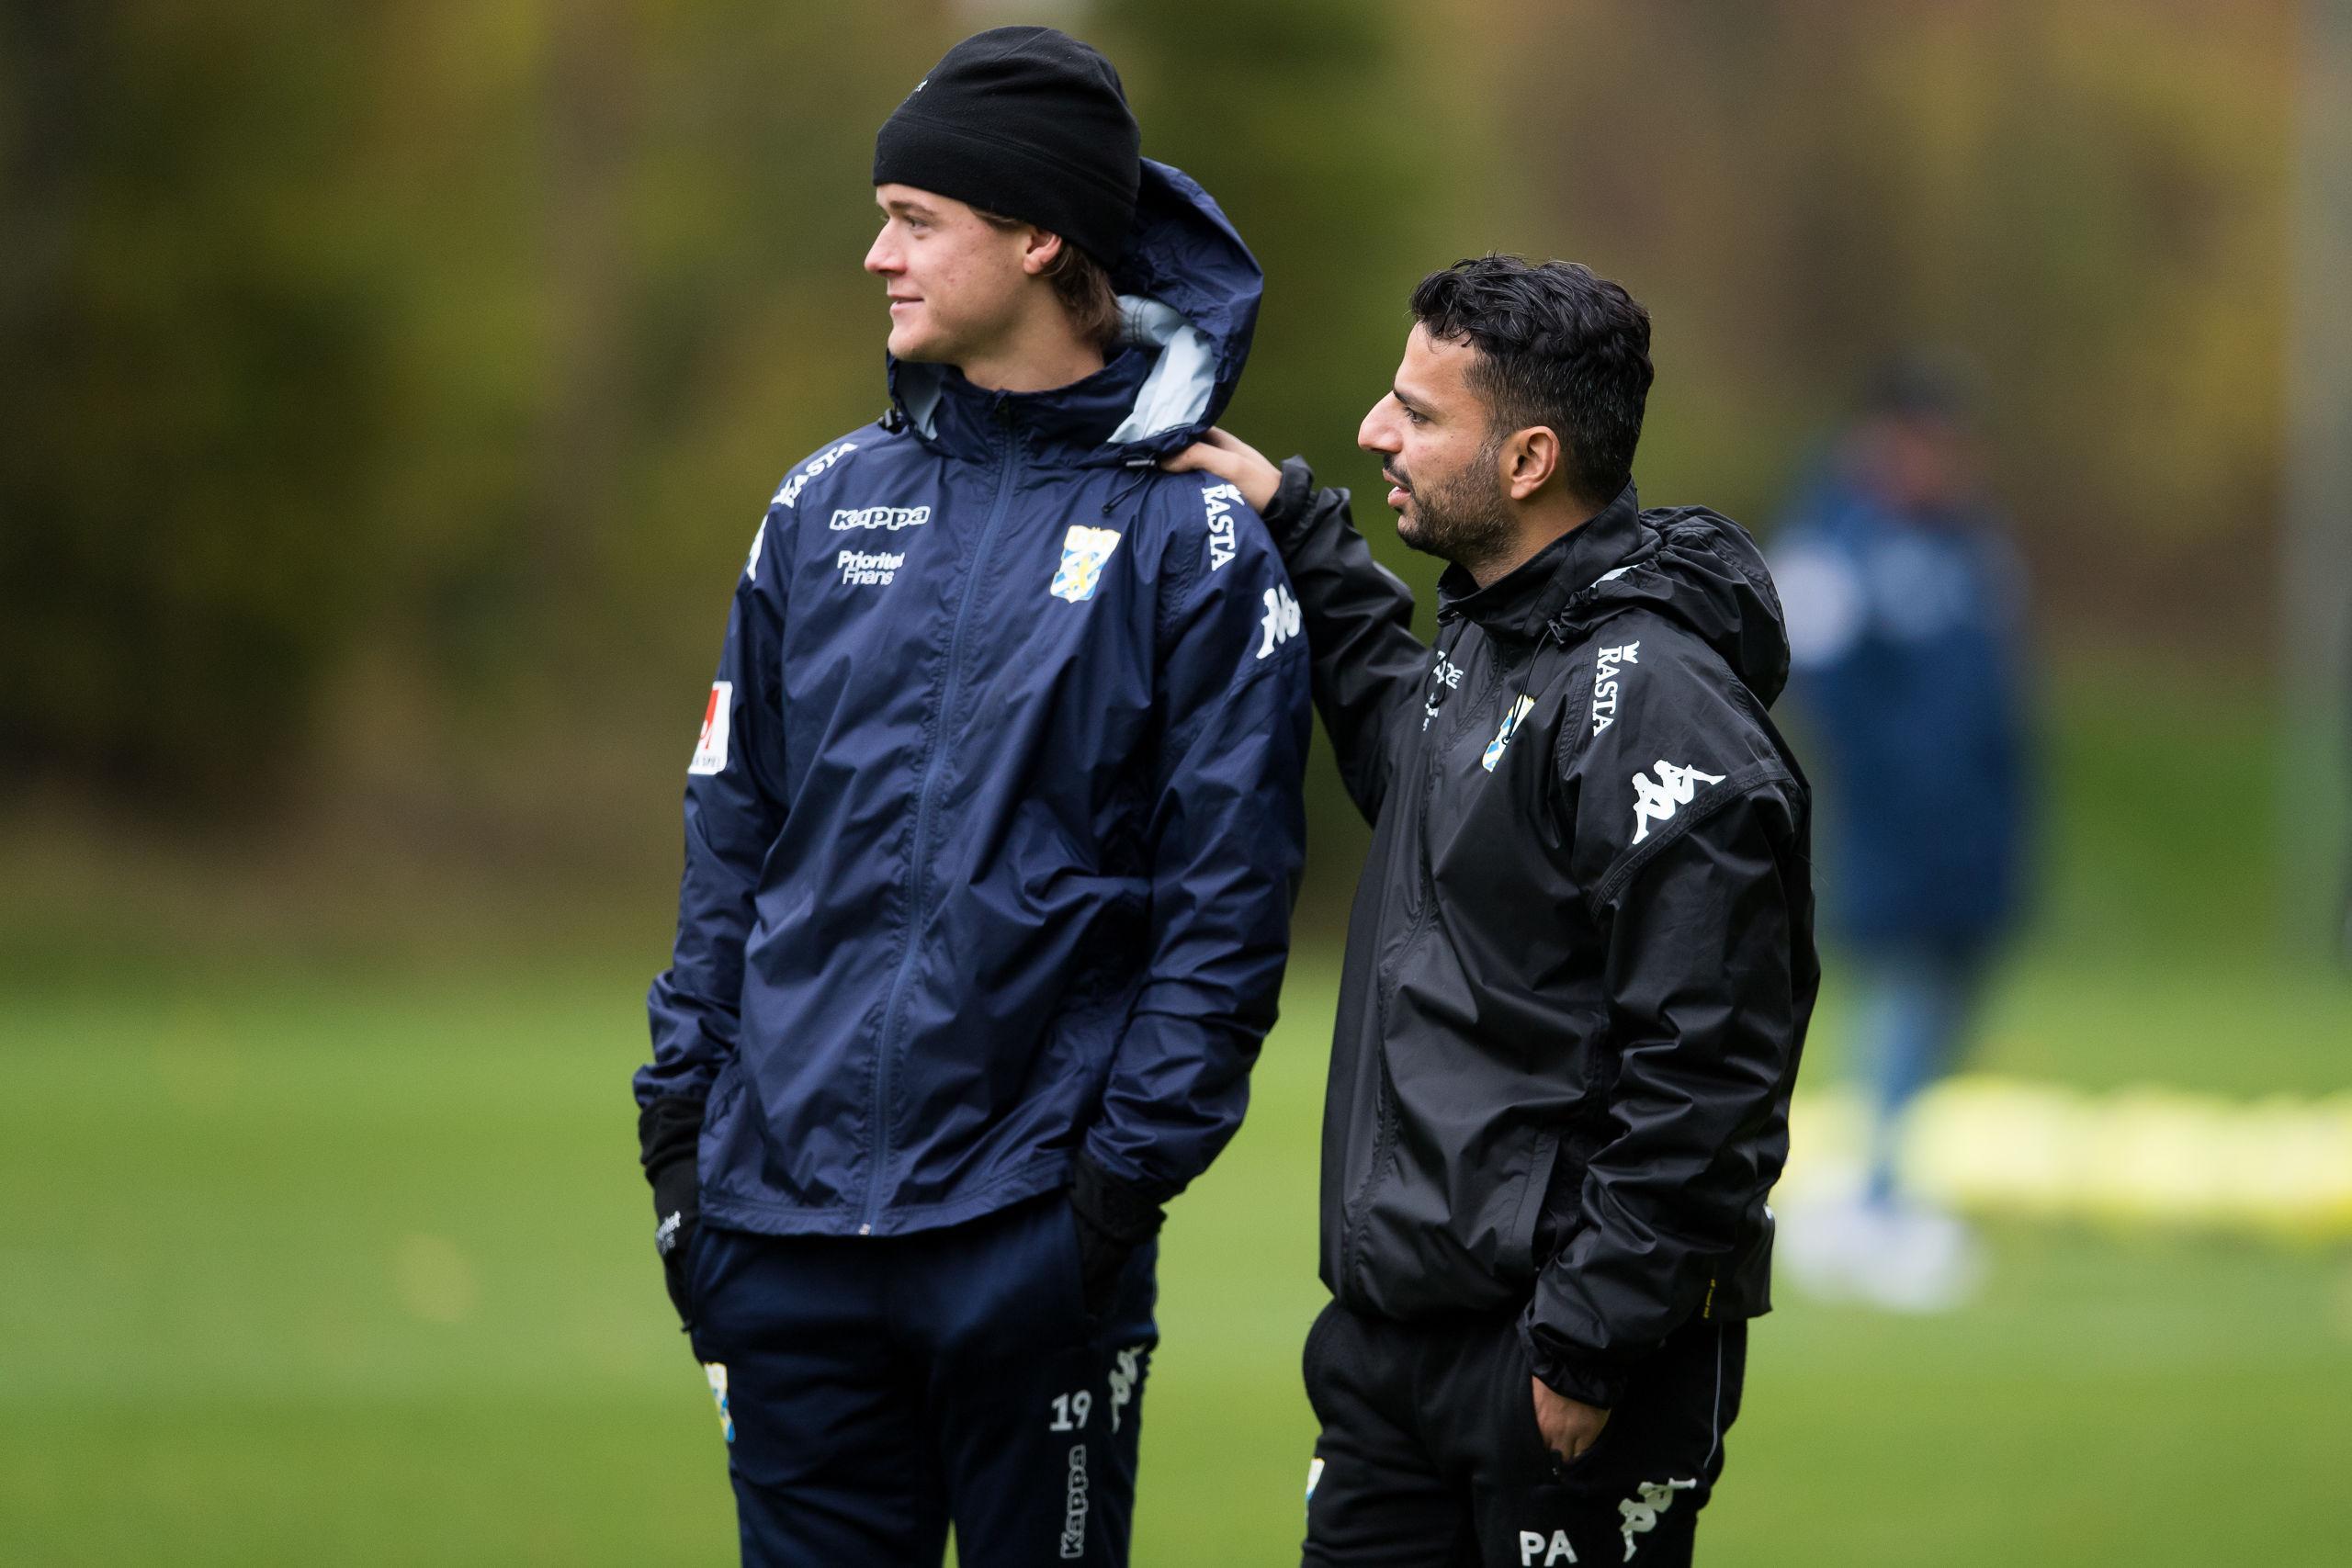 Efter svaga cuptrenden – kan IFK Göteborg lyfta 2020?